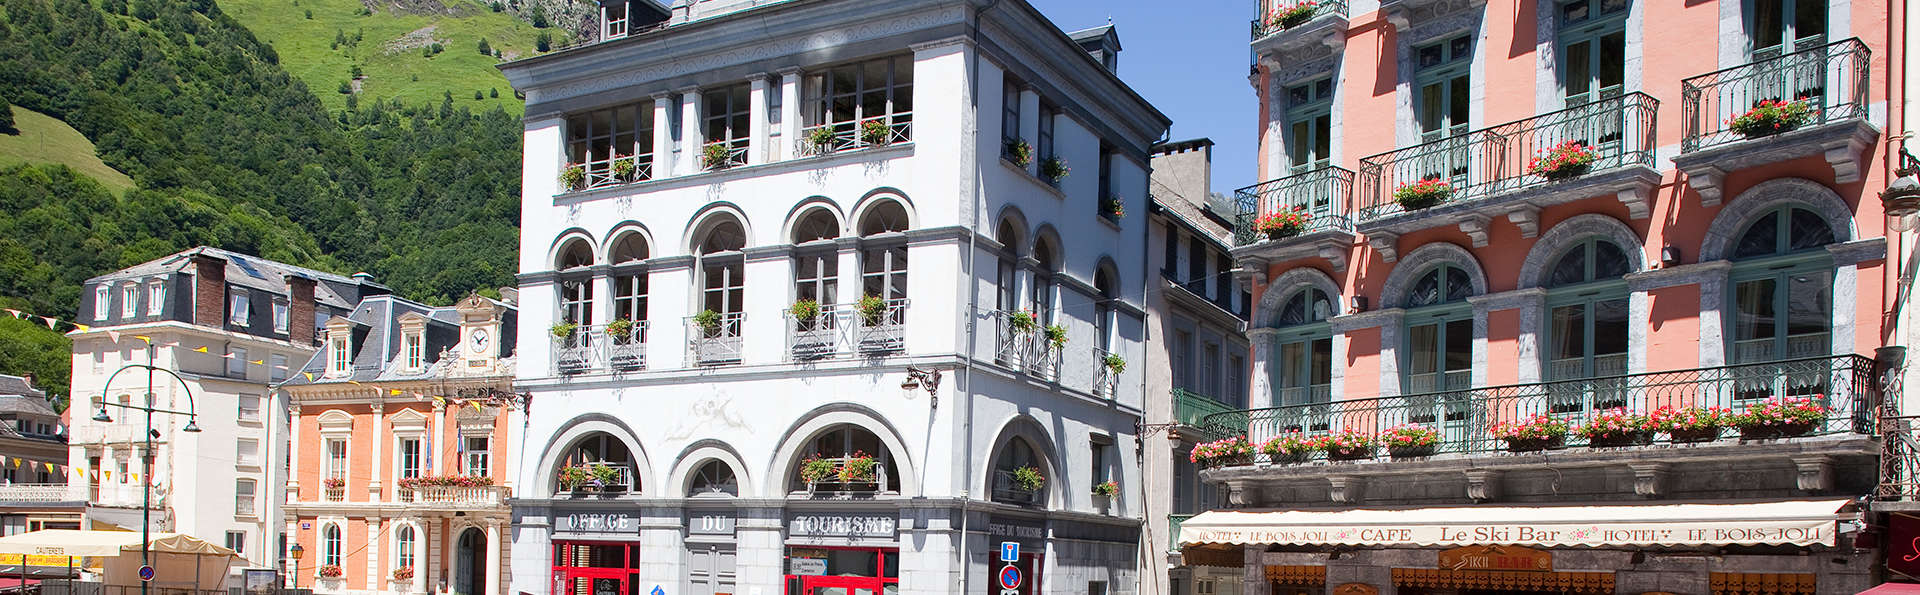 Hôtel Le Bois Joli - edit_front2.jpg